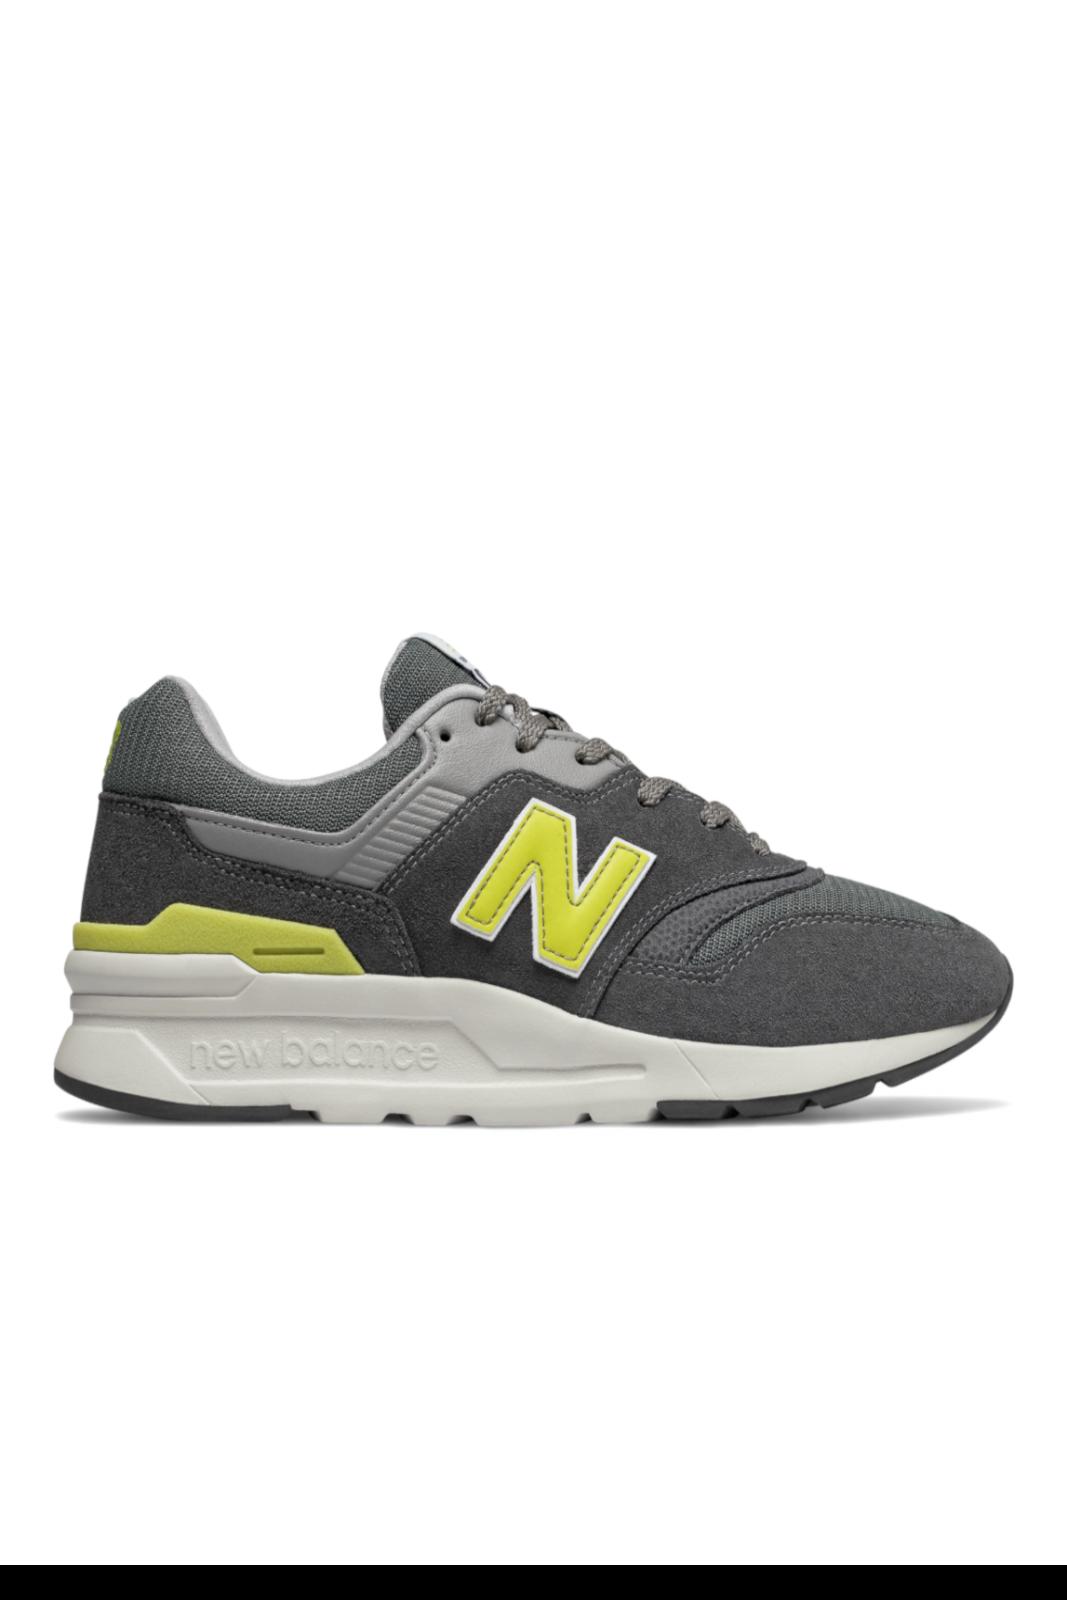 New Balance Sneaker | Collezione Uomo Outlet | Parmax